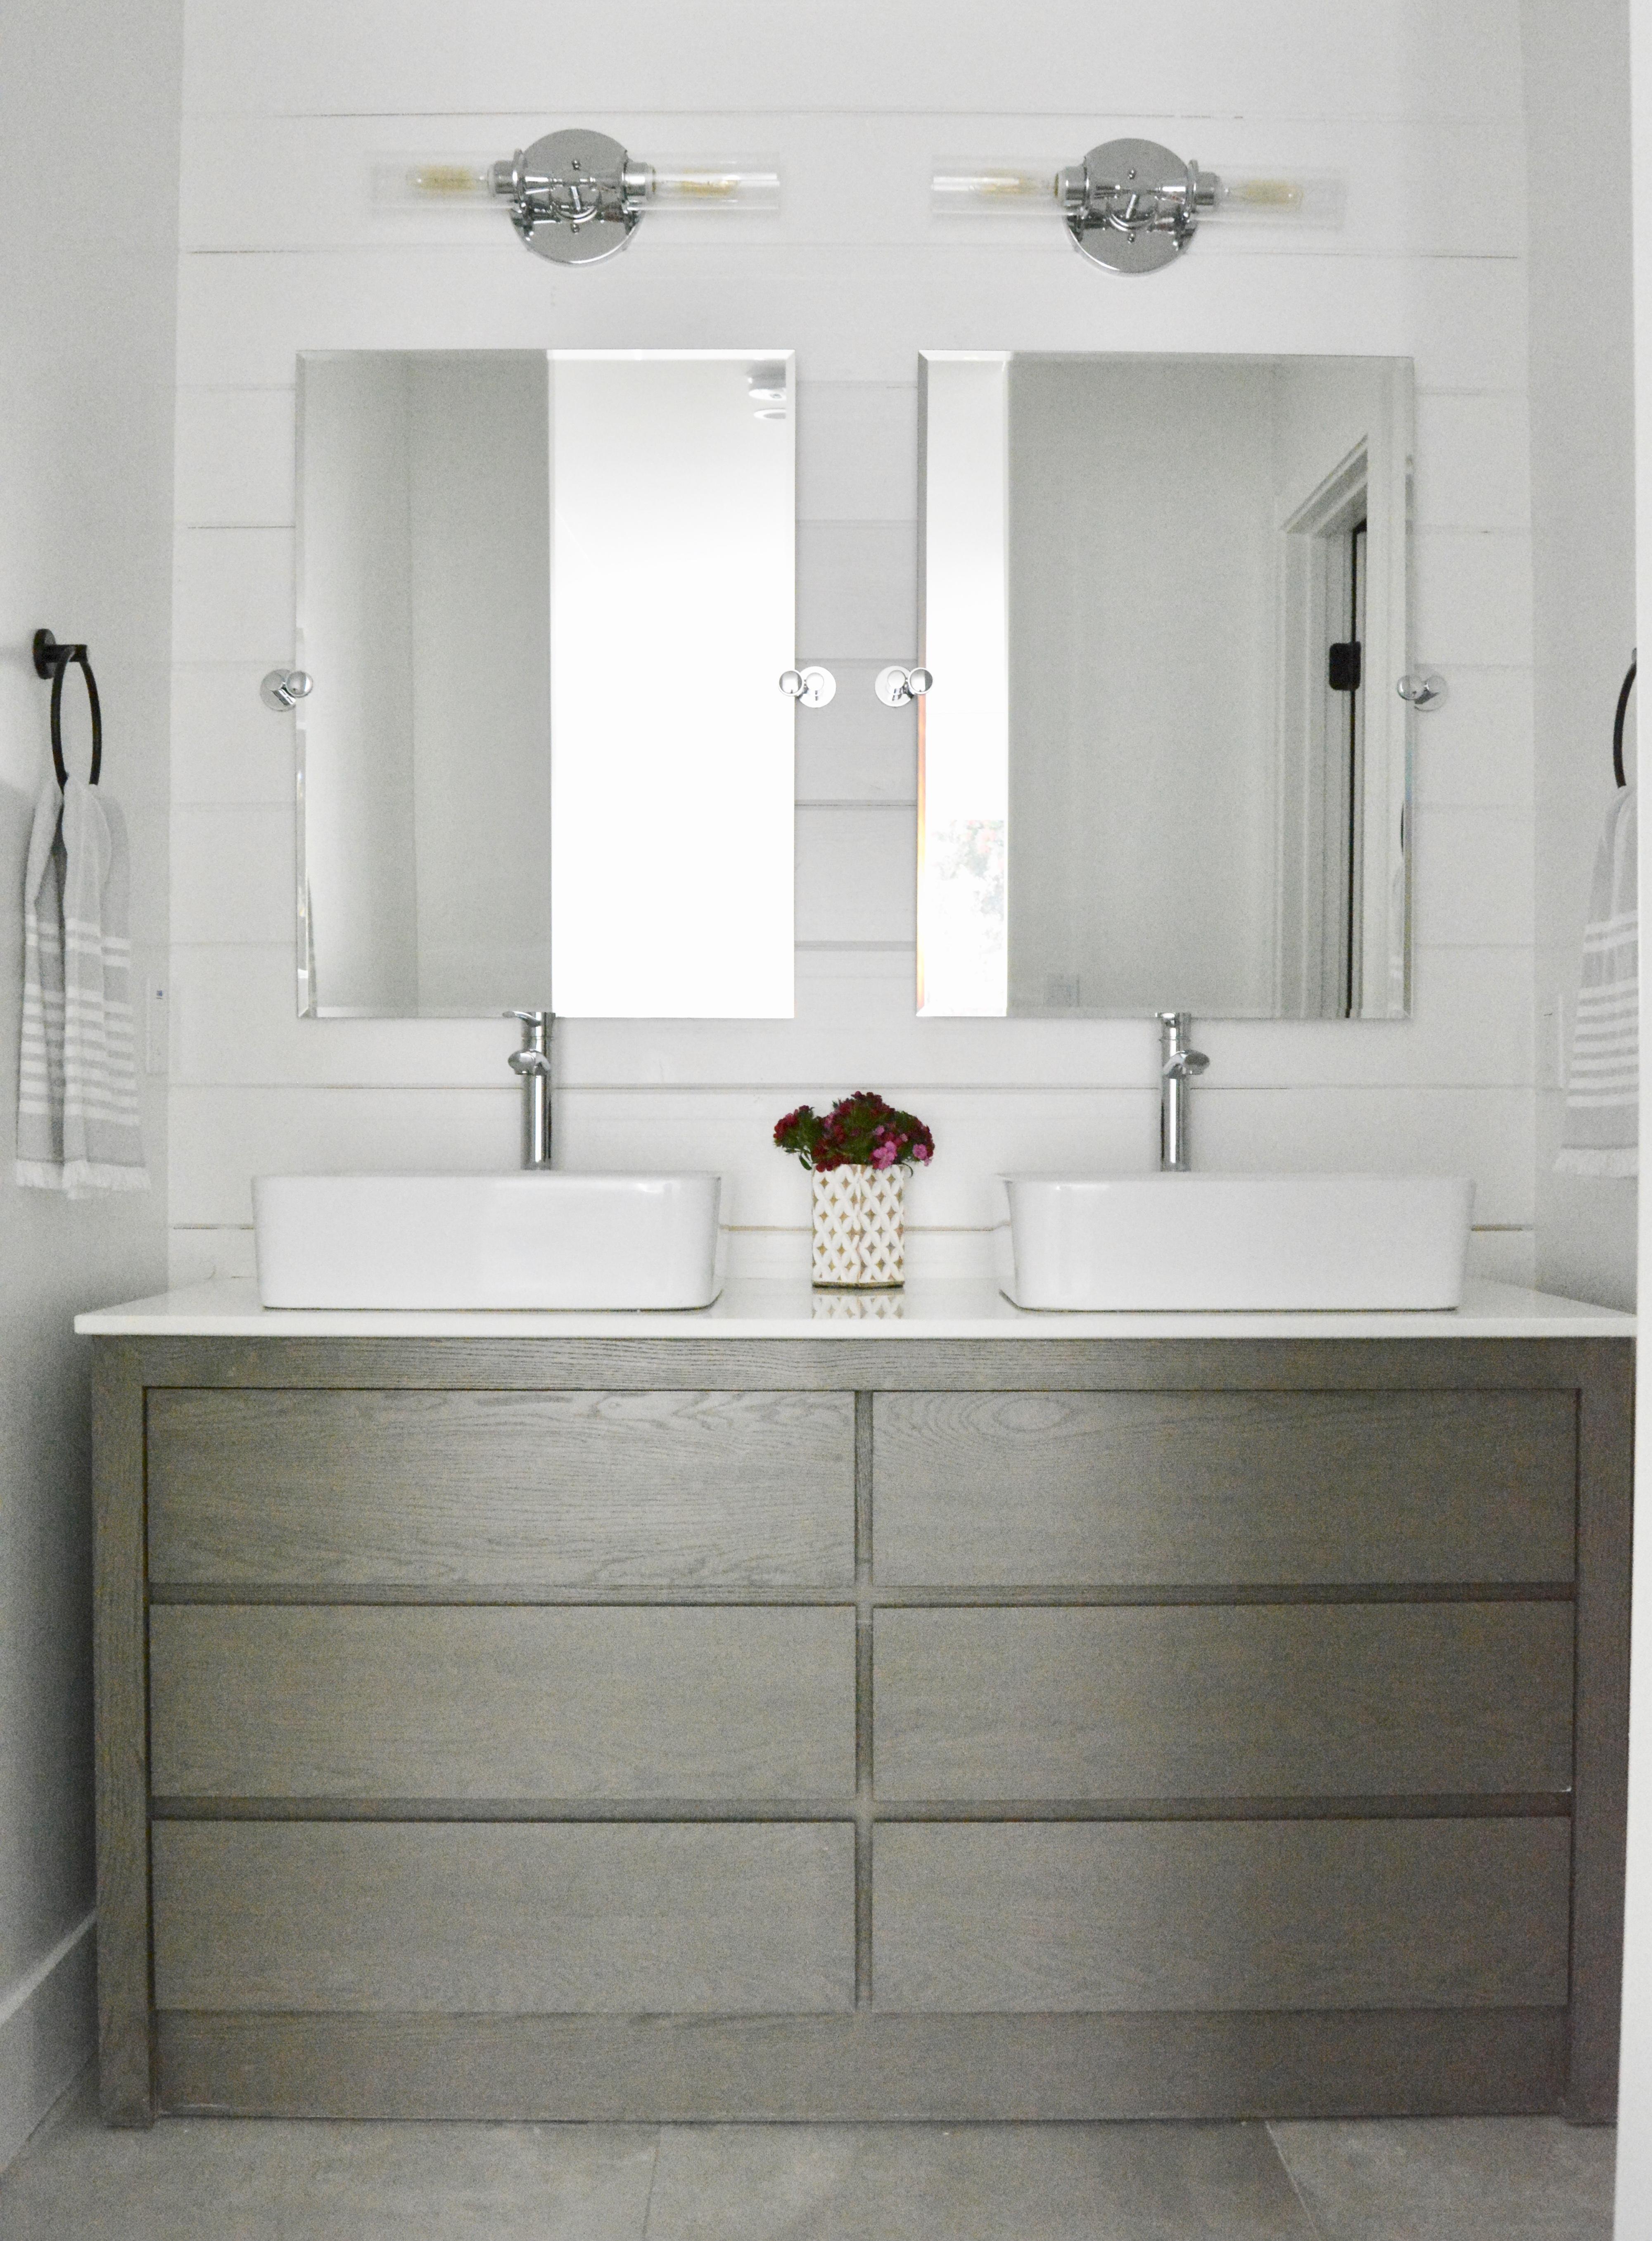 white shiplap bathroom wood vanity vessel sinks industrial lighting mixed metals fish and arrow interiors janna parr